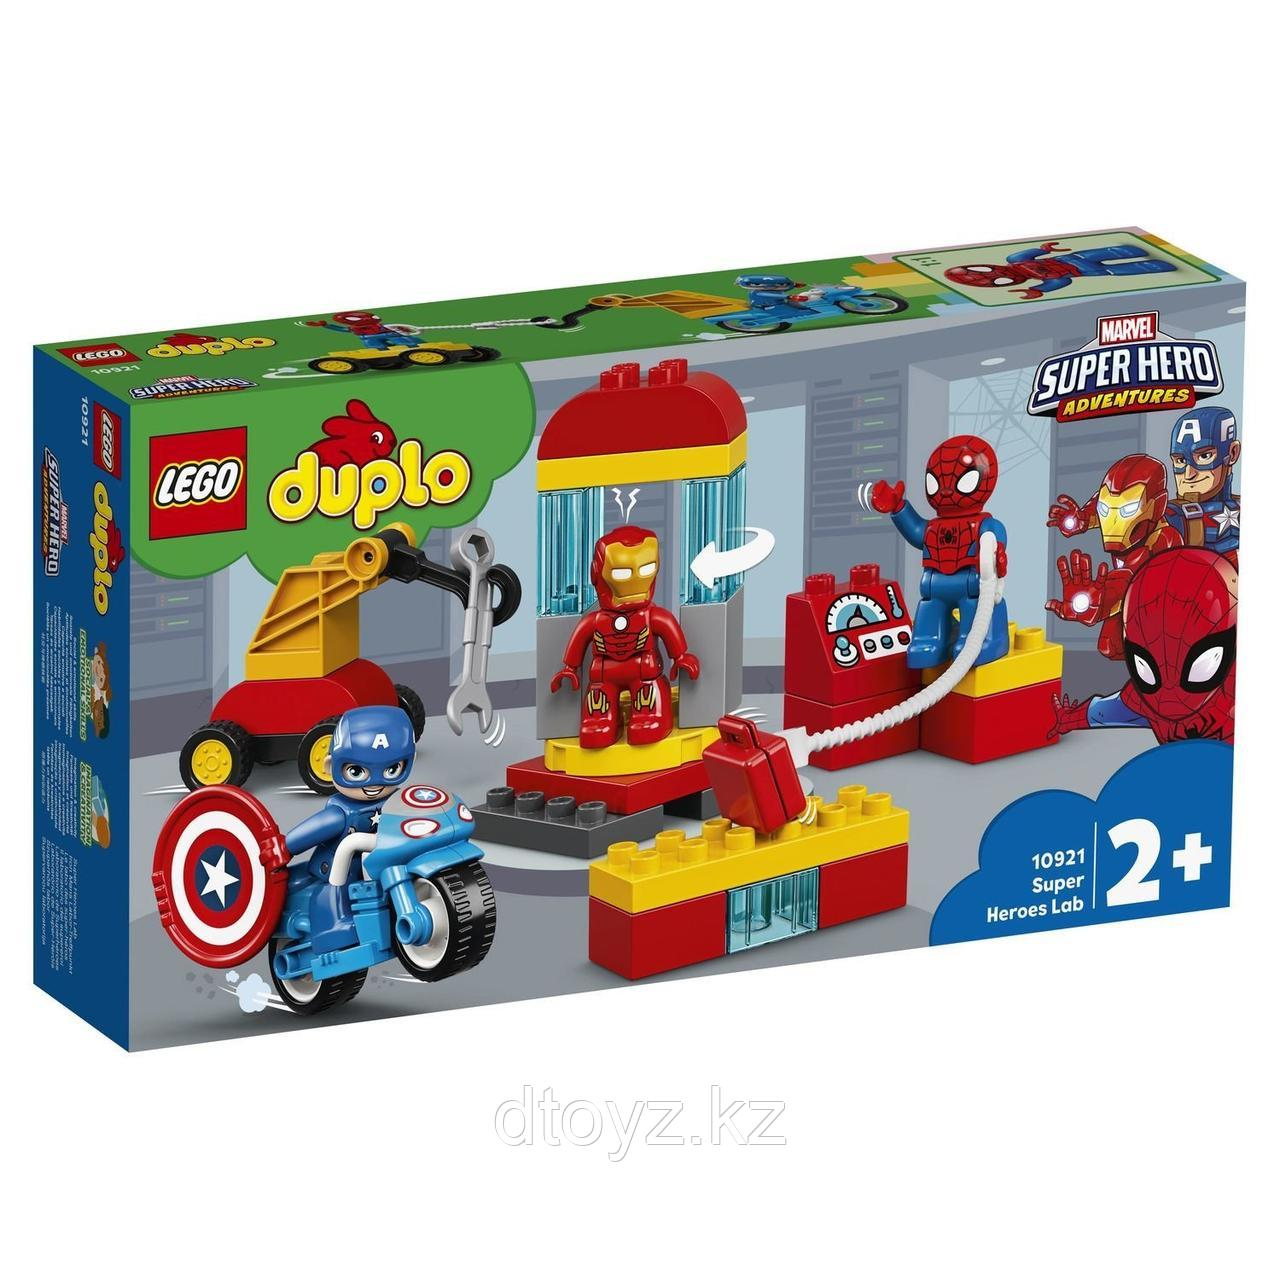 LEGO Duplo 10921 Super Heroes Лаборатория супергероев